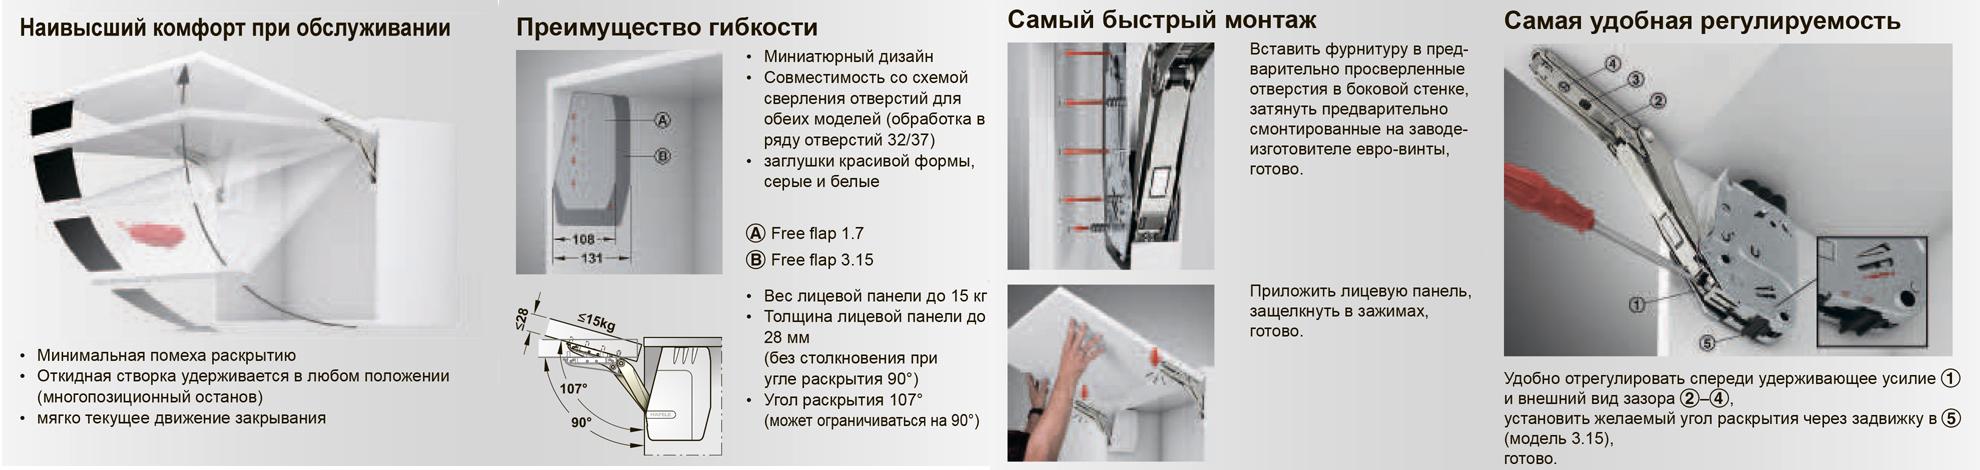 flap2.jpg